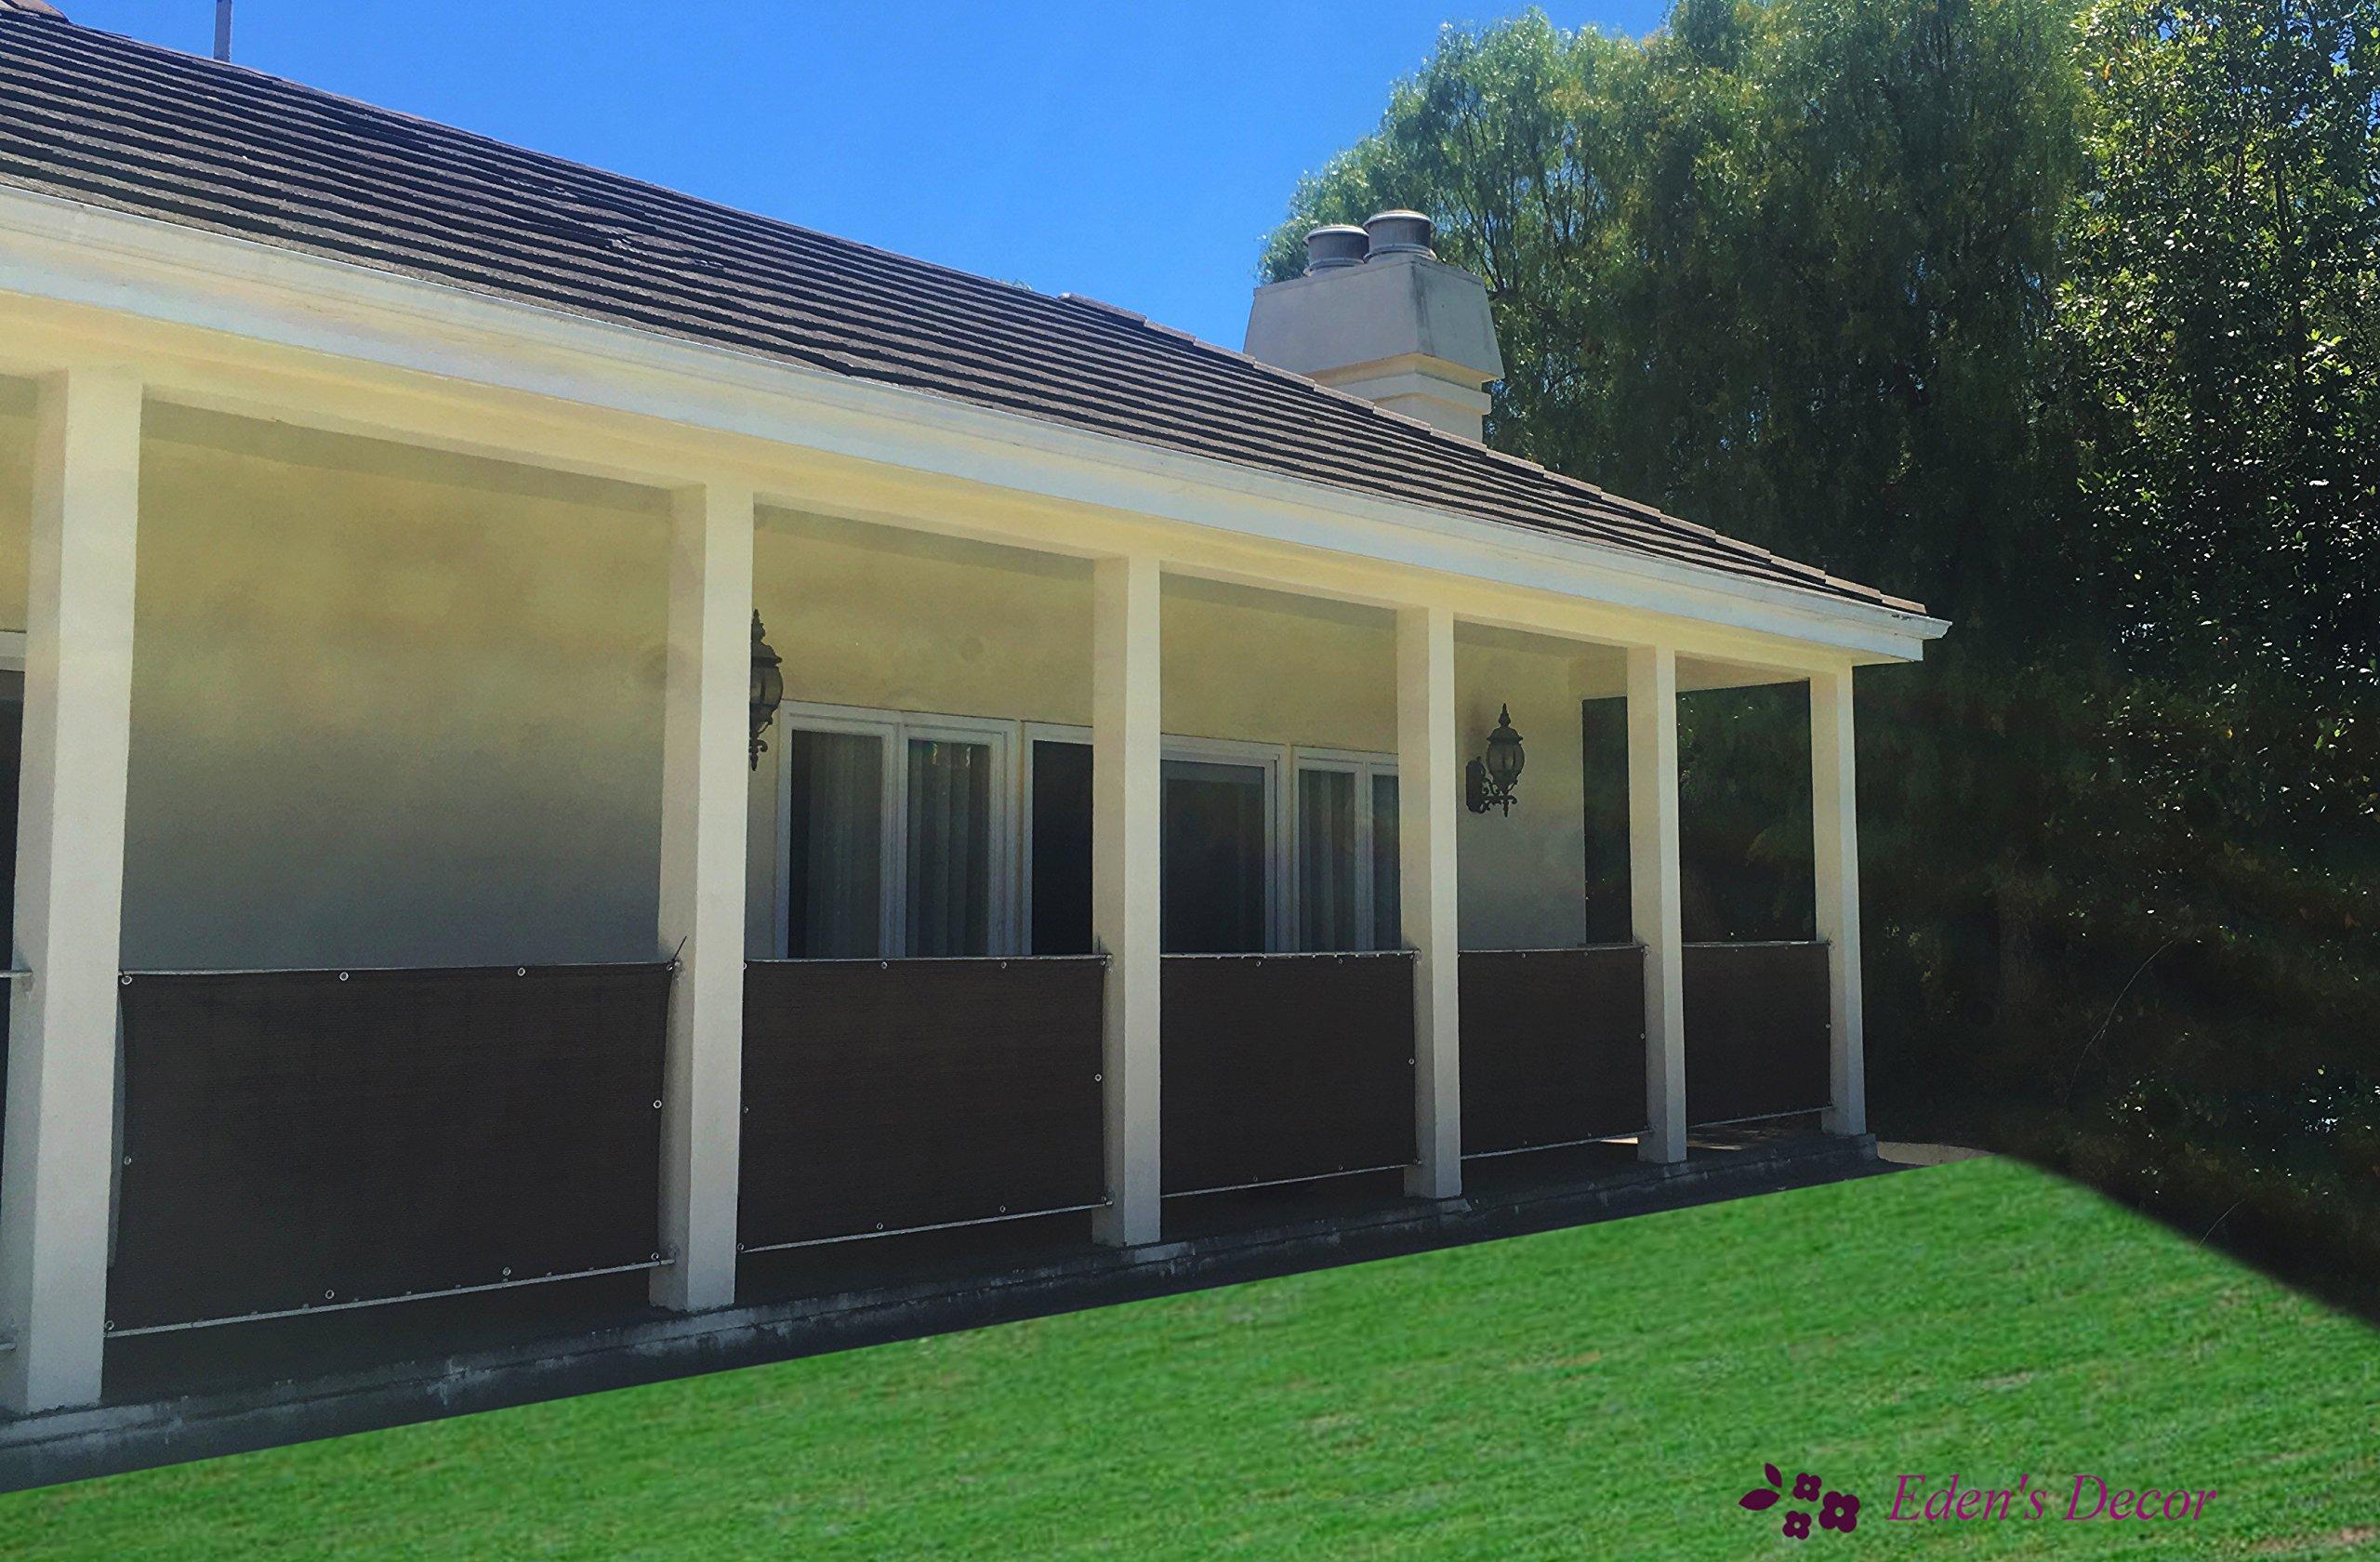 Eden's Decor Customizable Privacy Screen Mesh Windscreen For Backyard Deck, Patio, Balcony, Pool, Porch, Fence, Railing, Gardening (35'' X 60'' Inches, Brown)